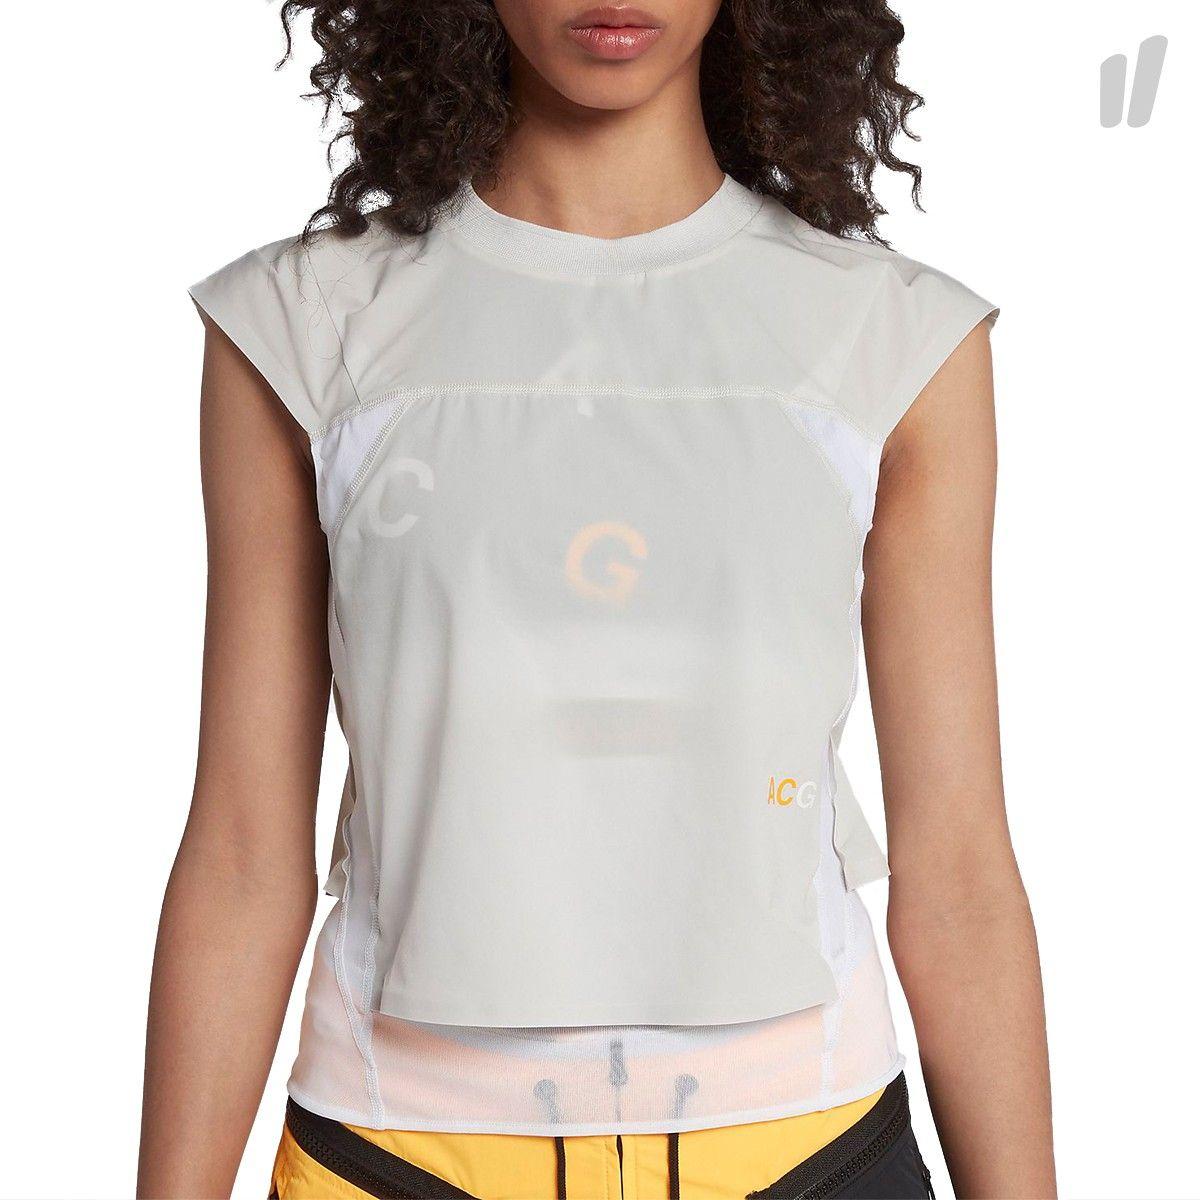 save off 612ab 1e858 Nike Wmns NRG ACG Top ( AJ0988 092 ), Clothing, Women, New,